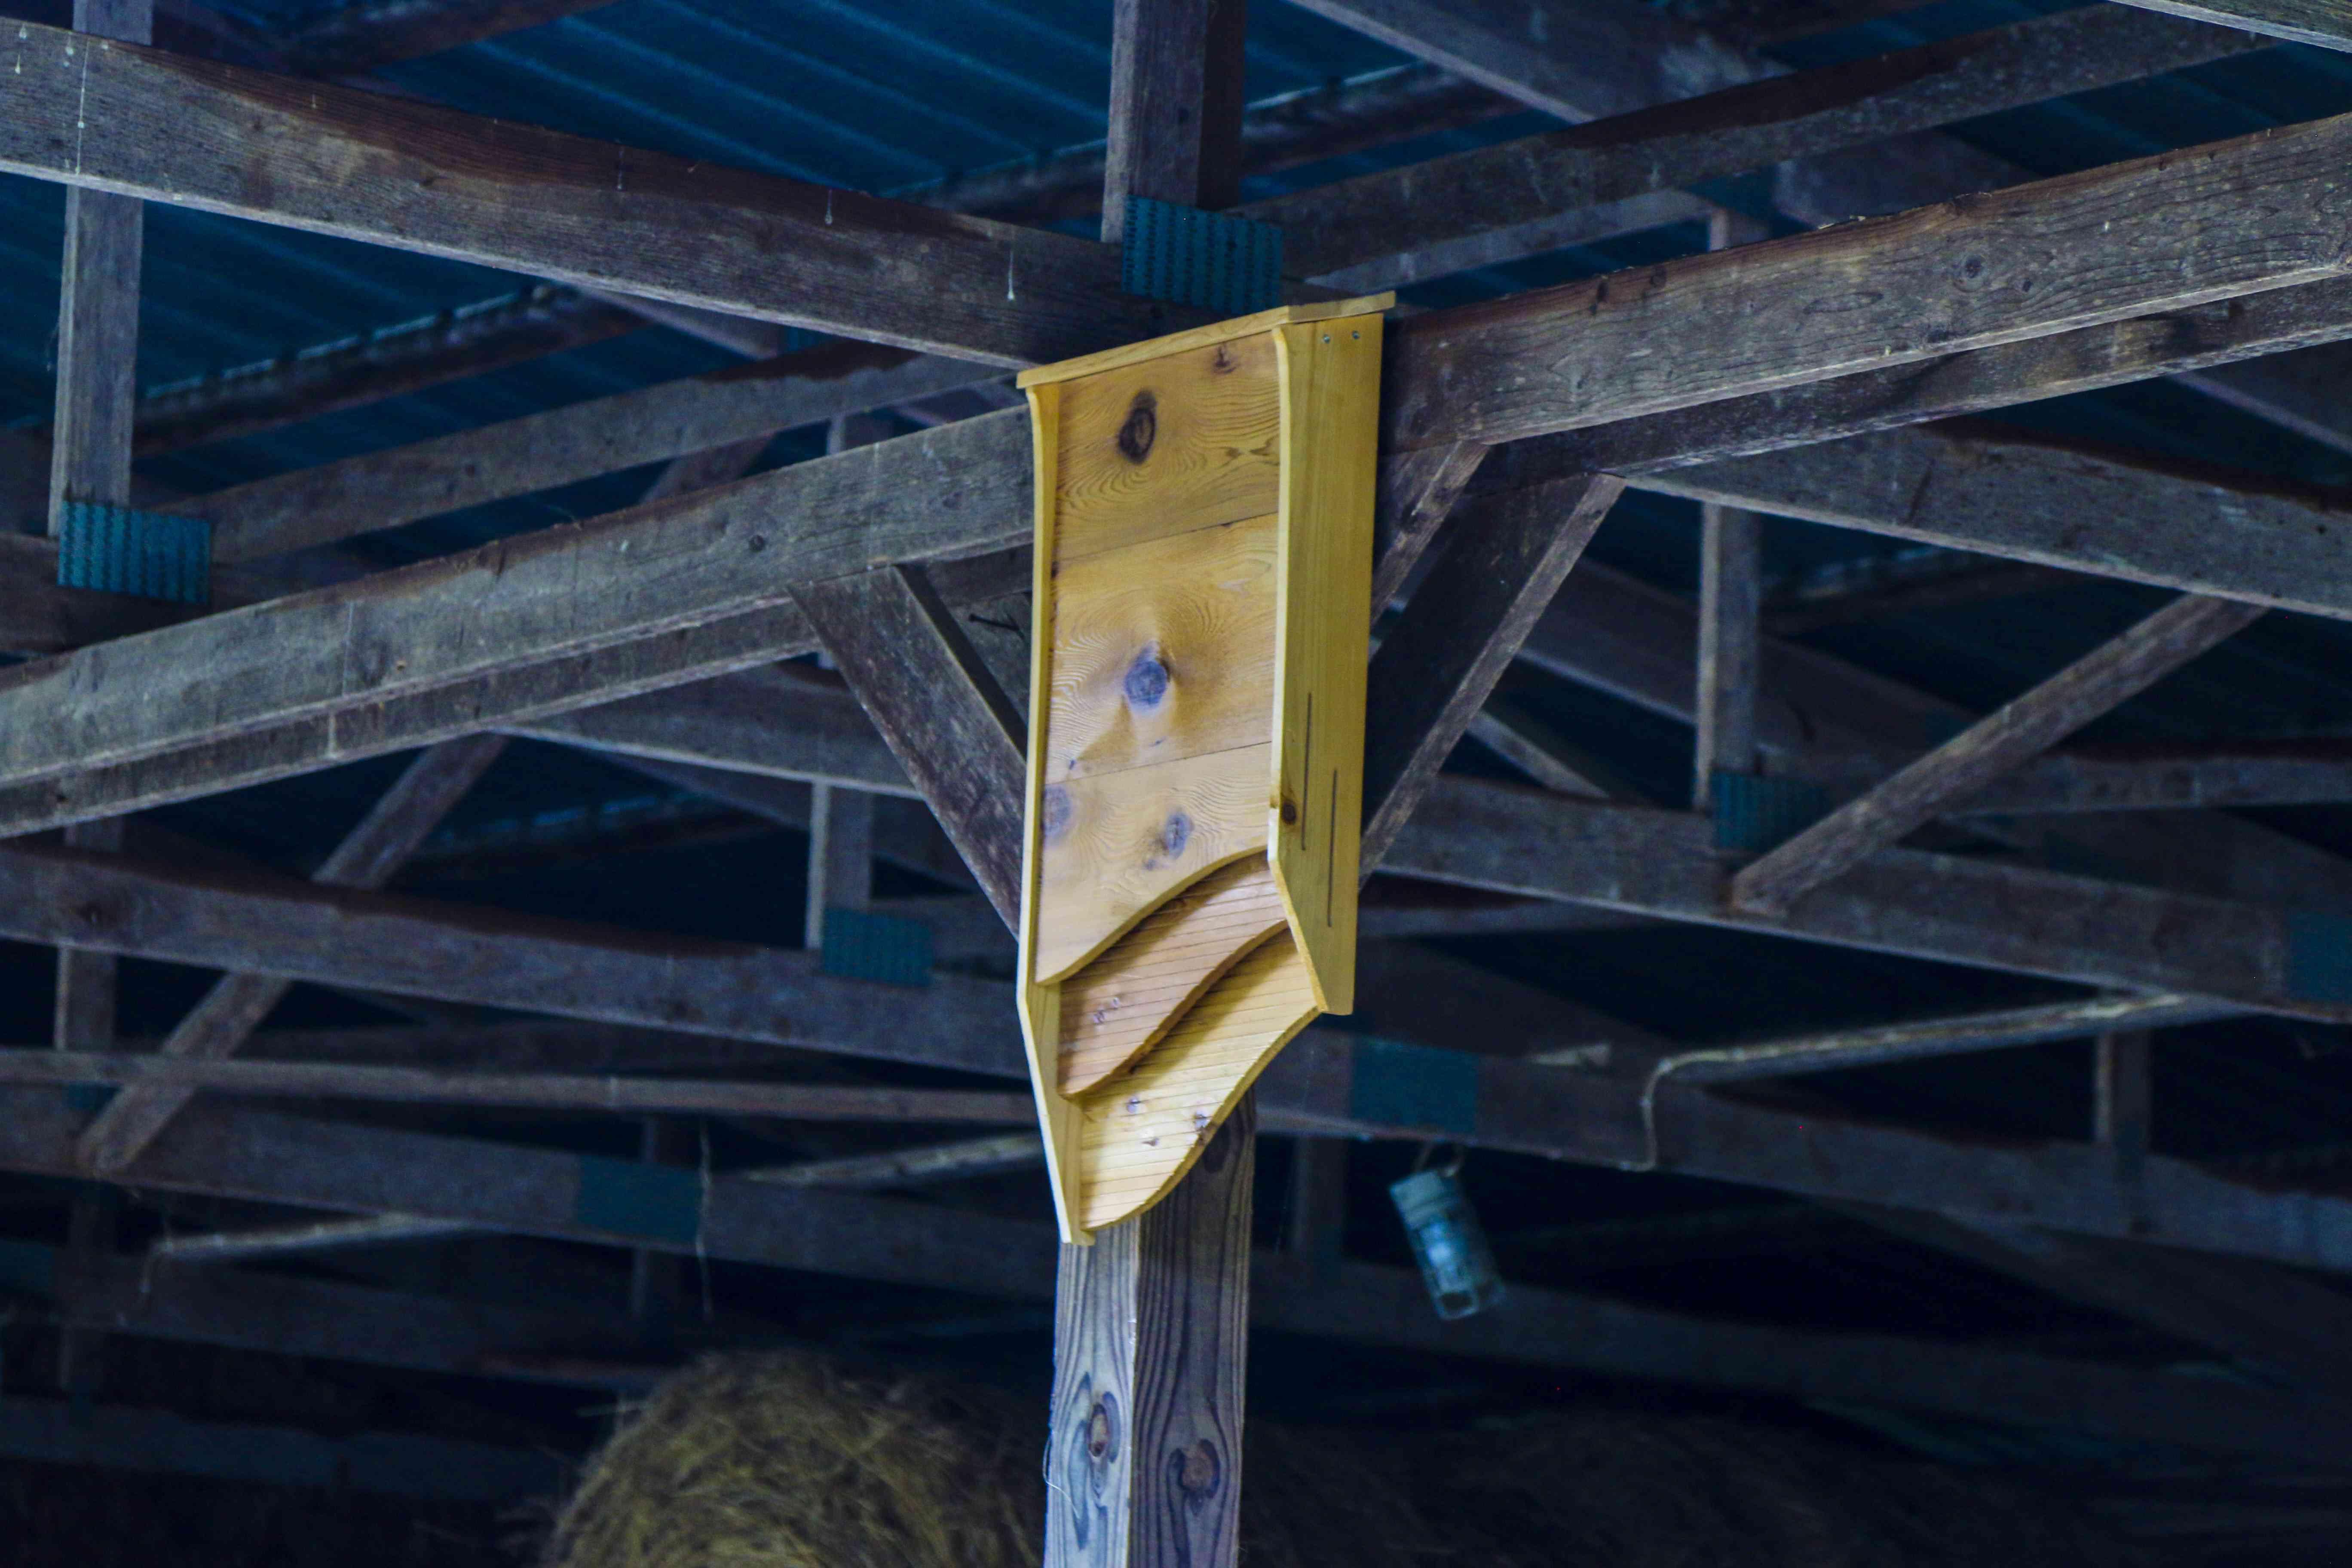 BatBNB bat house in a barn